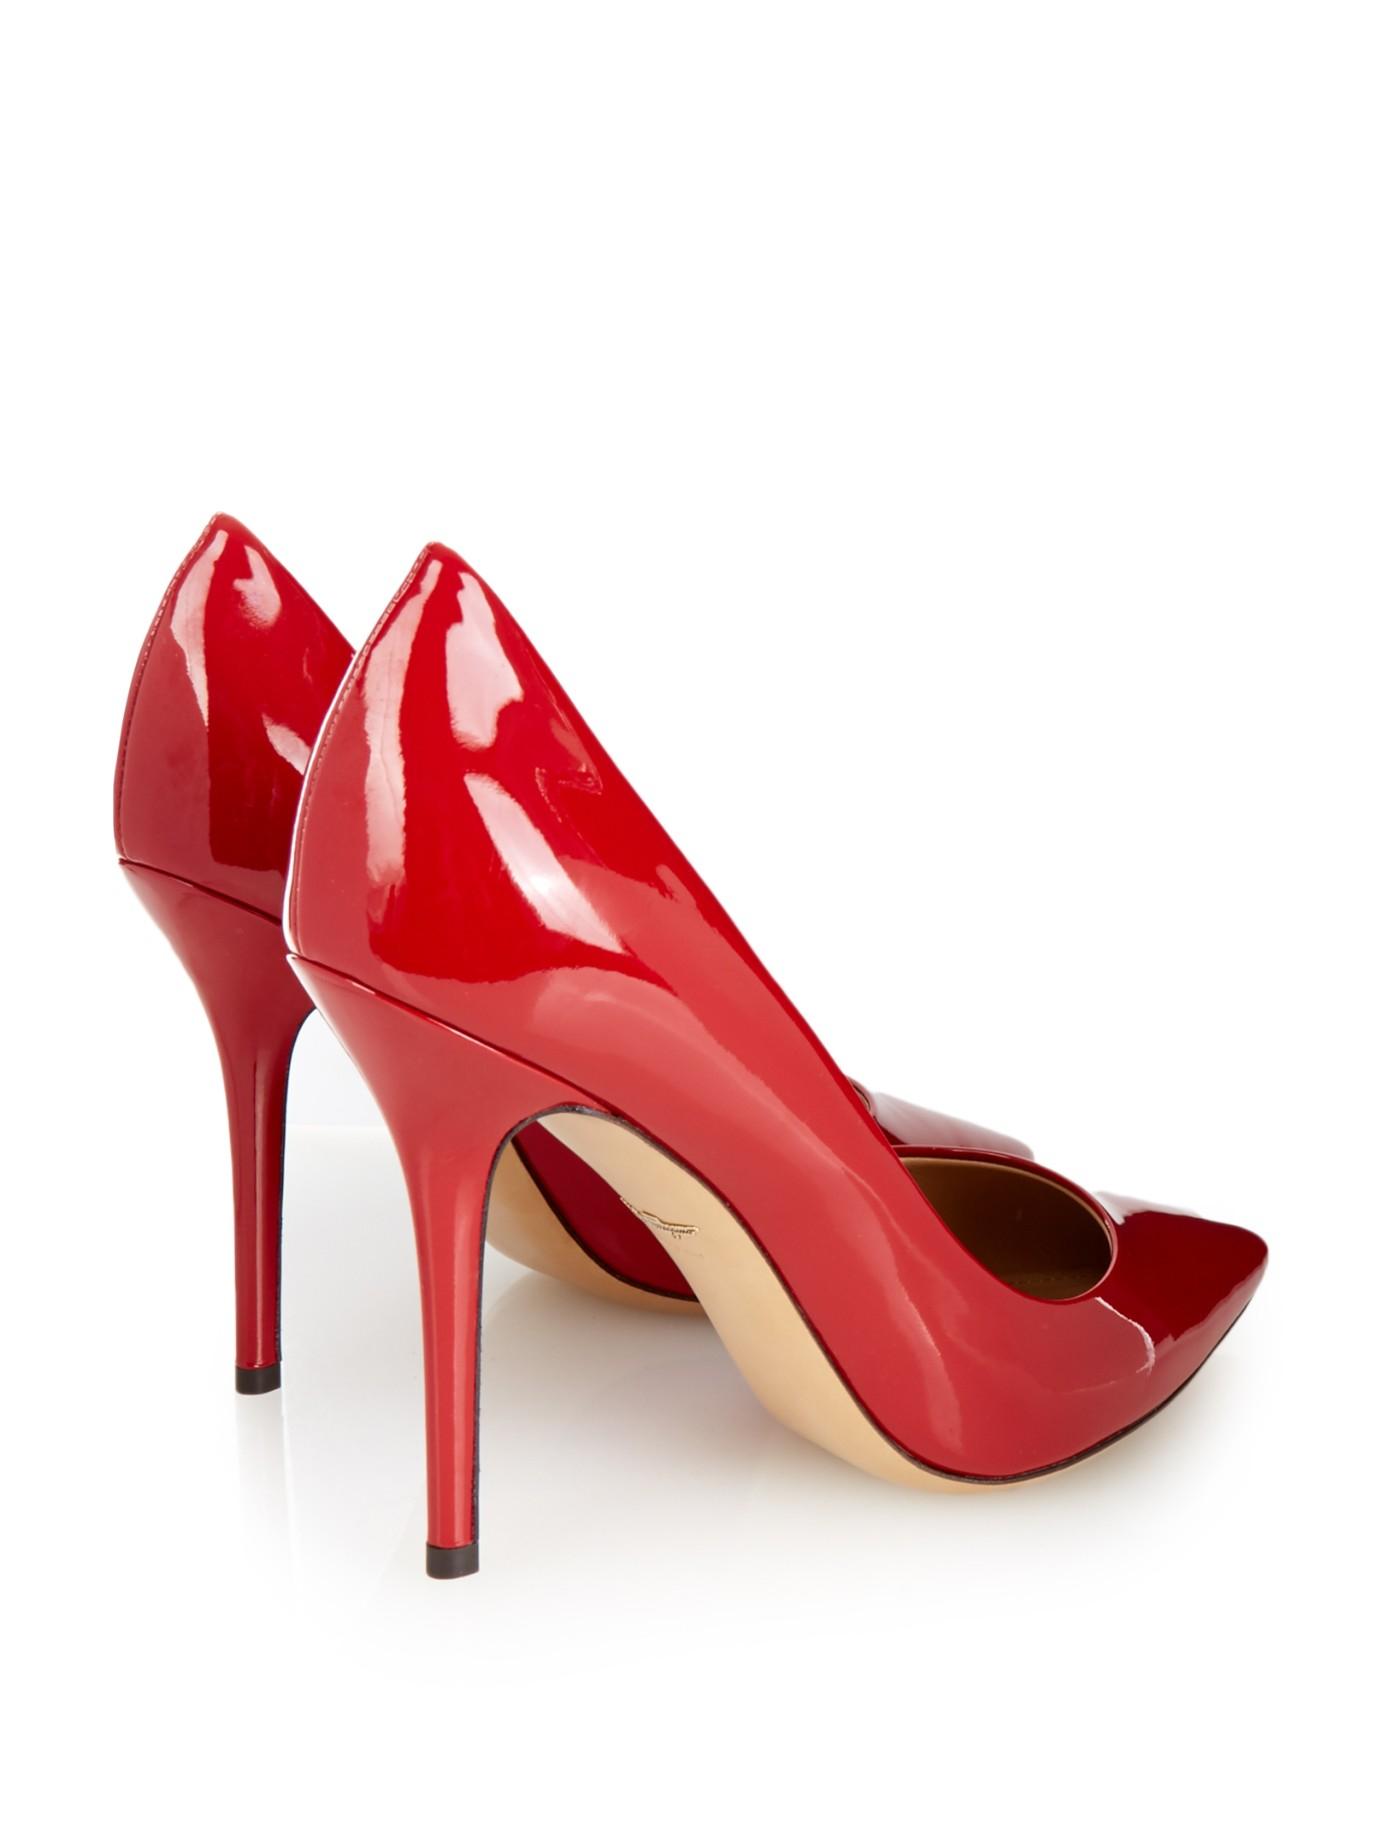 f27a5ae4aa4 Lyst - Ferragamo Susi Patent Leather Pumps in Red